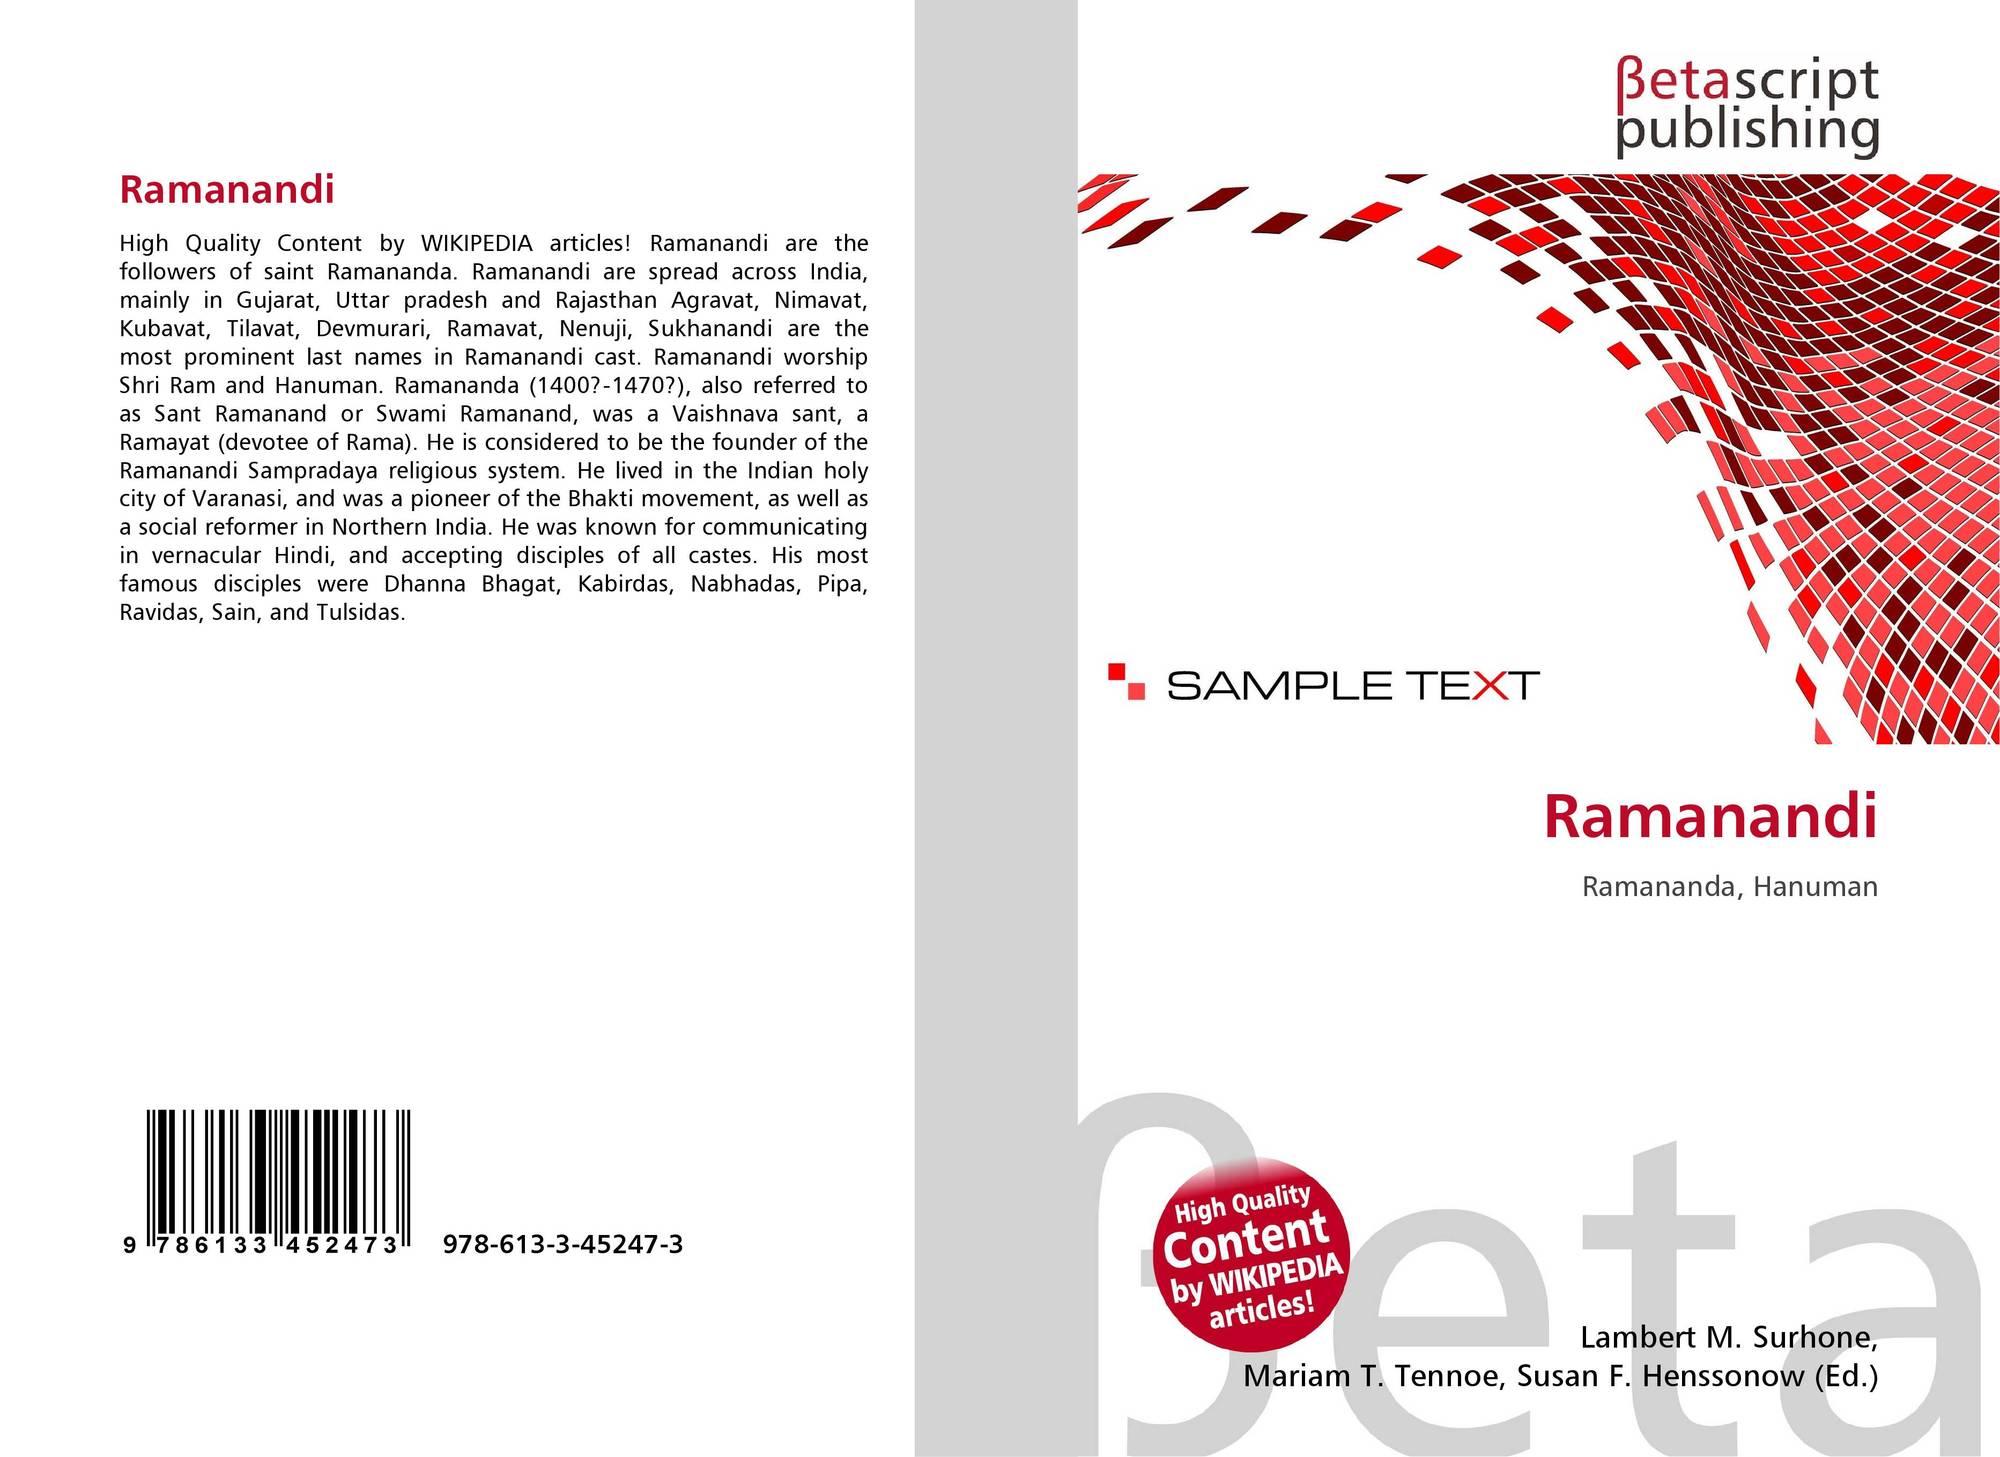 Ramanandi, 978-613-3-45247-3, 6133452471 ,9786133452473